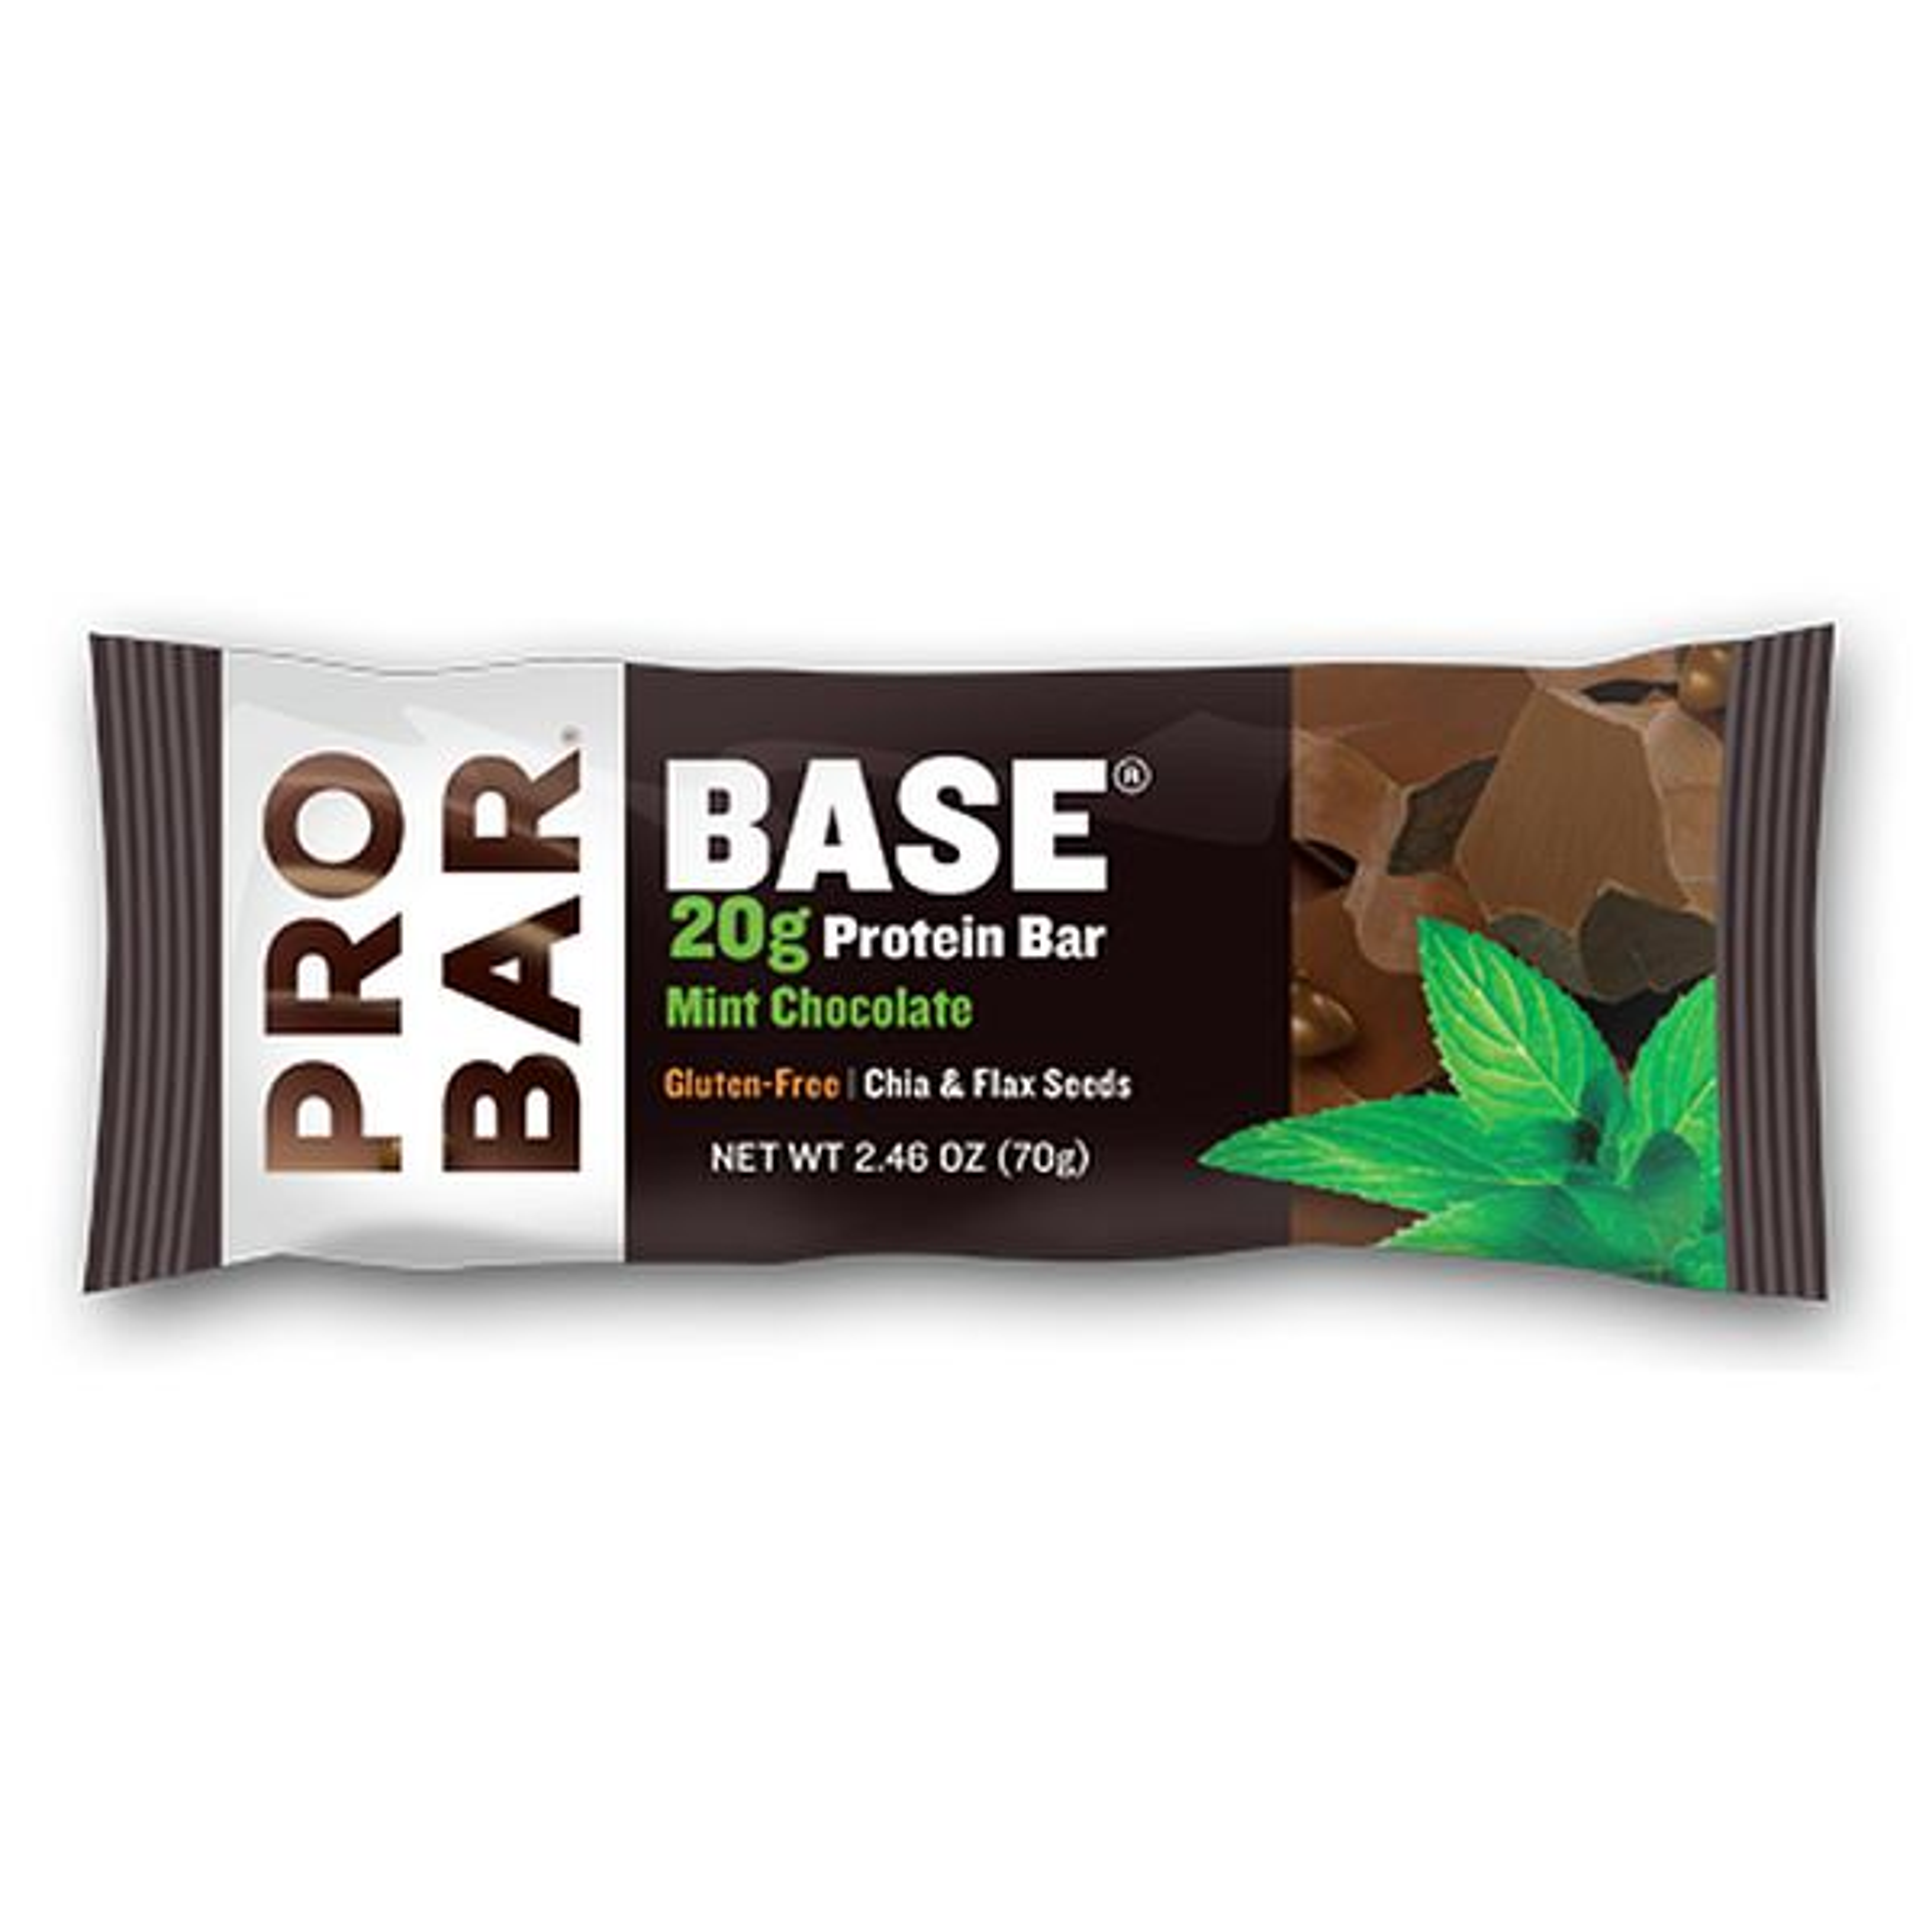 Mint Chocolate Core Bar